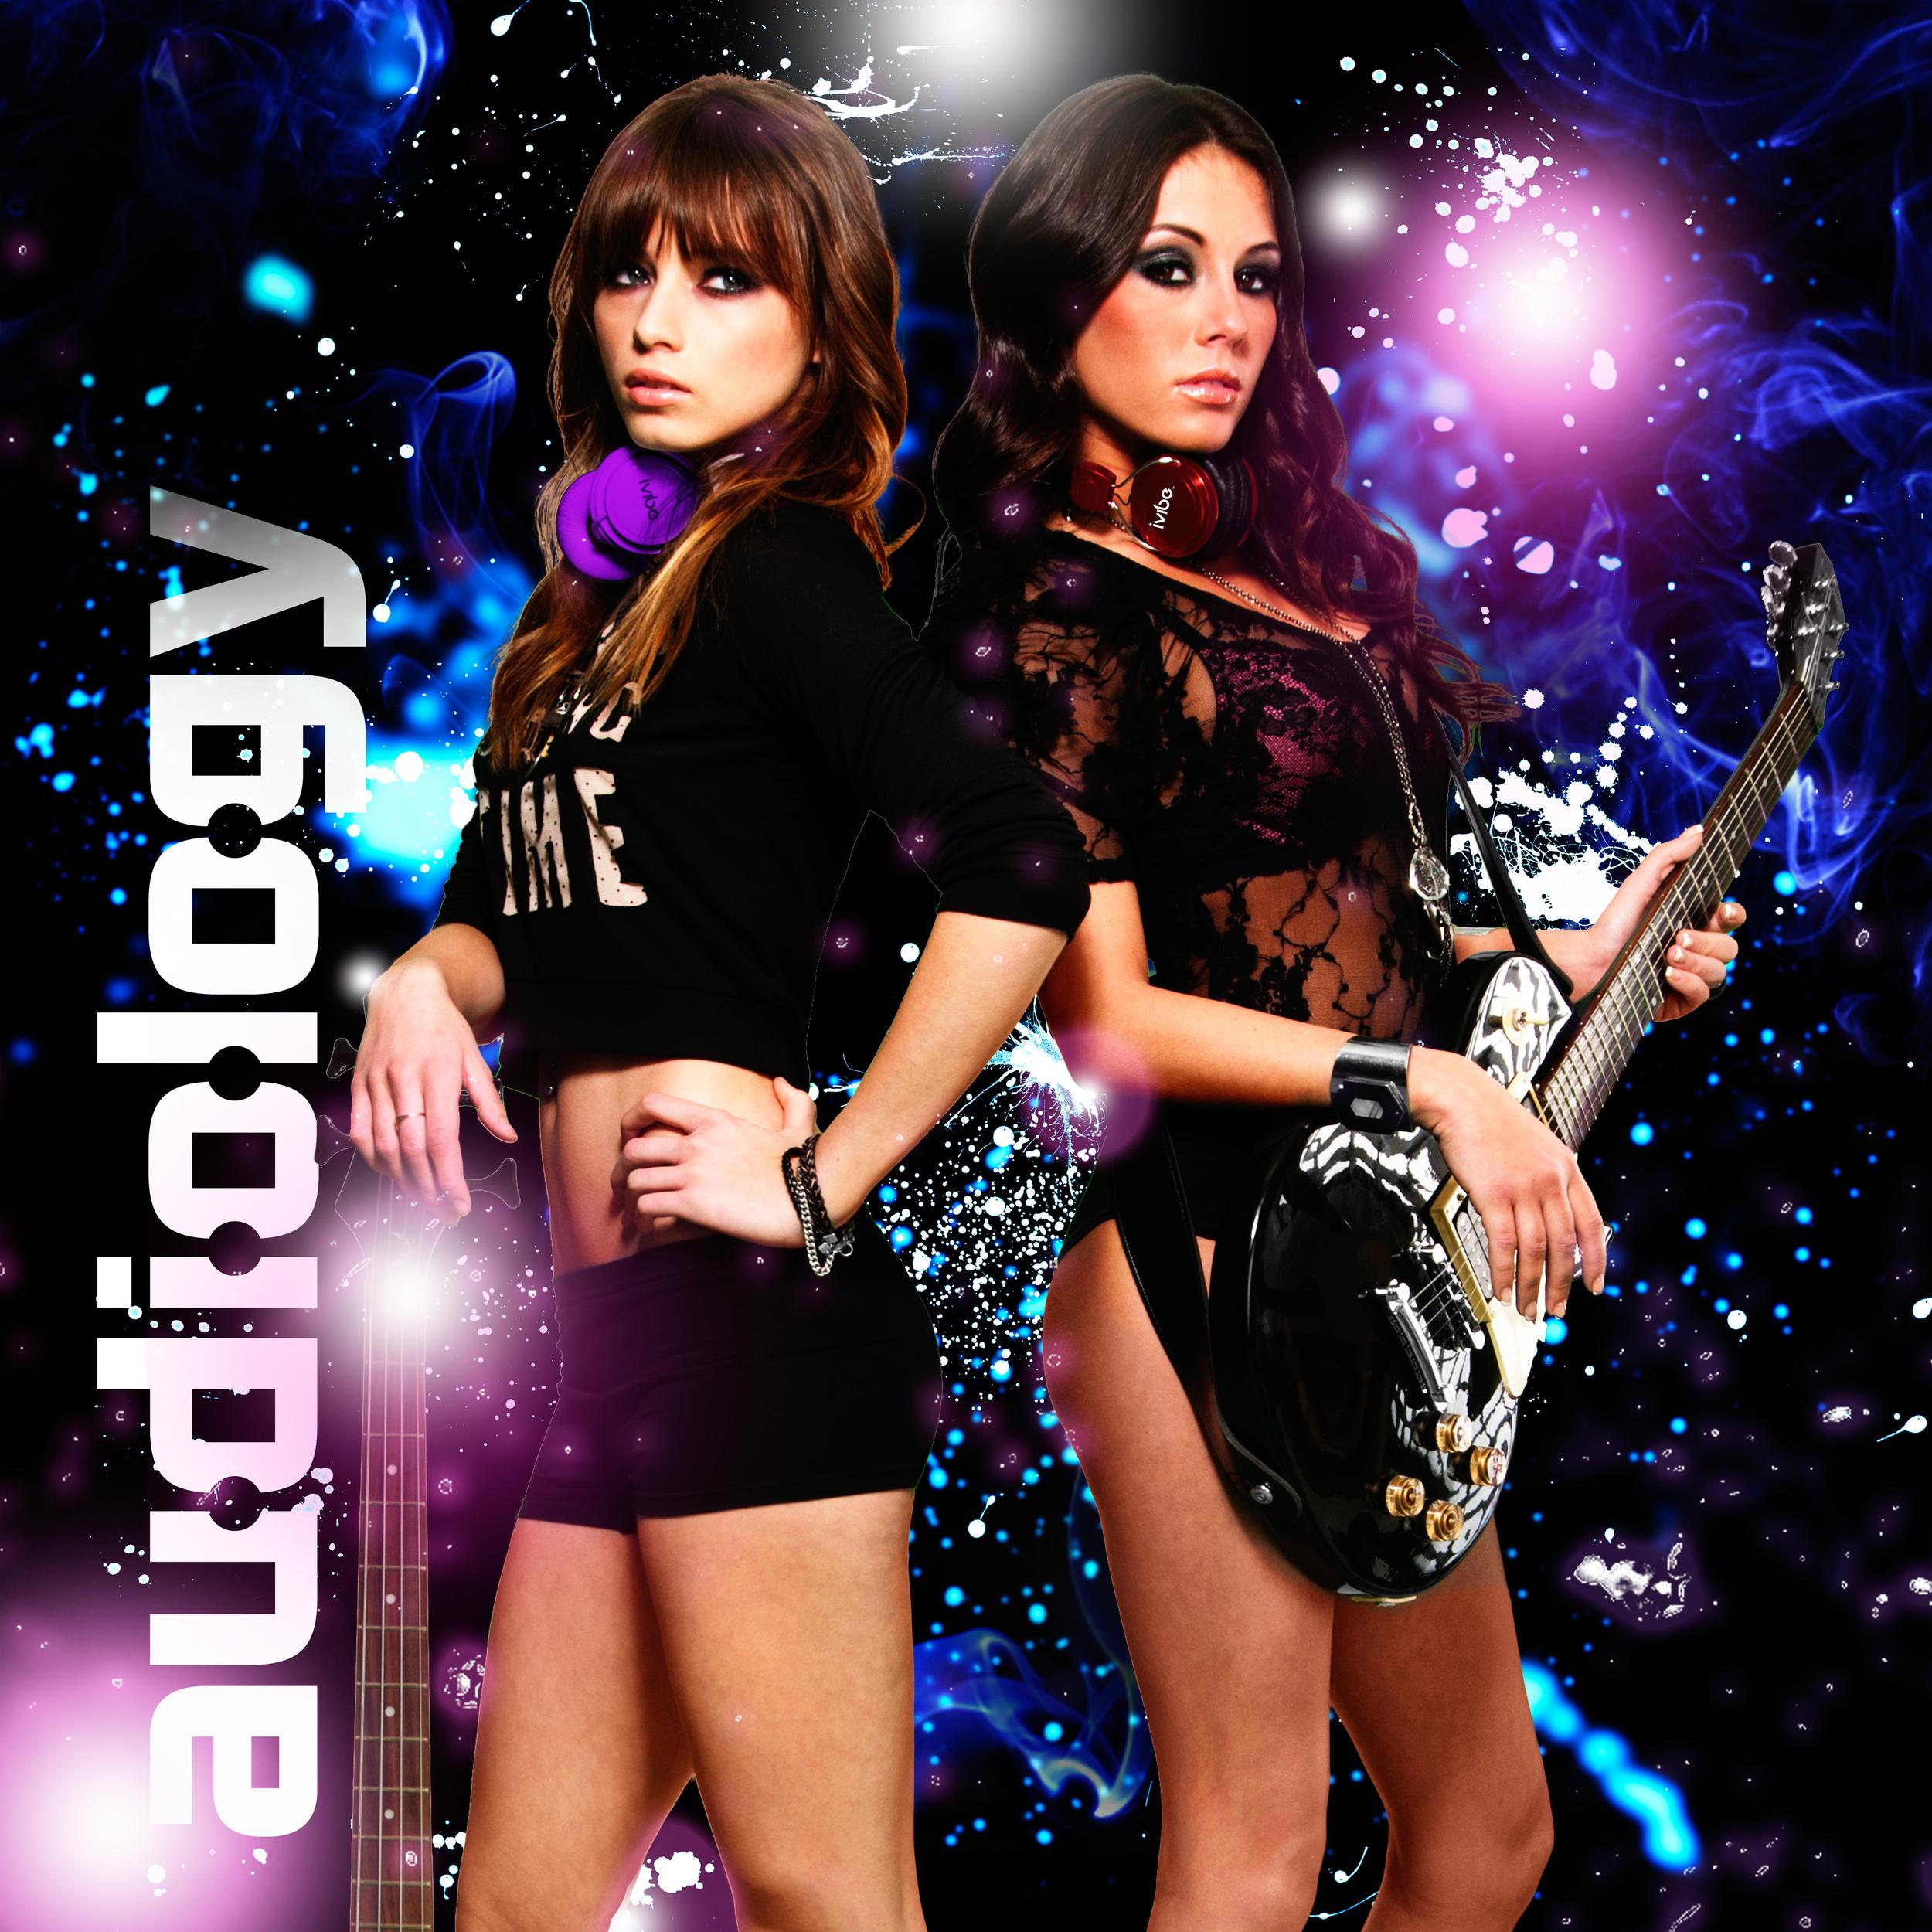 guitargirls.jpg